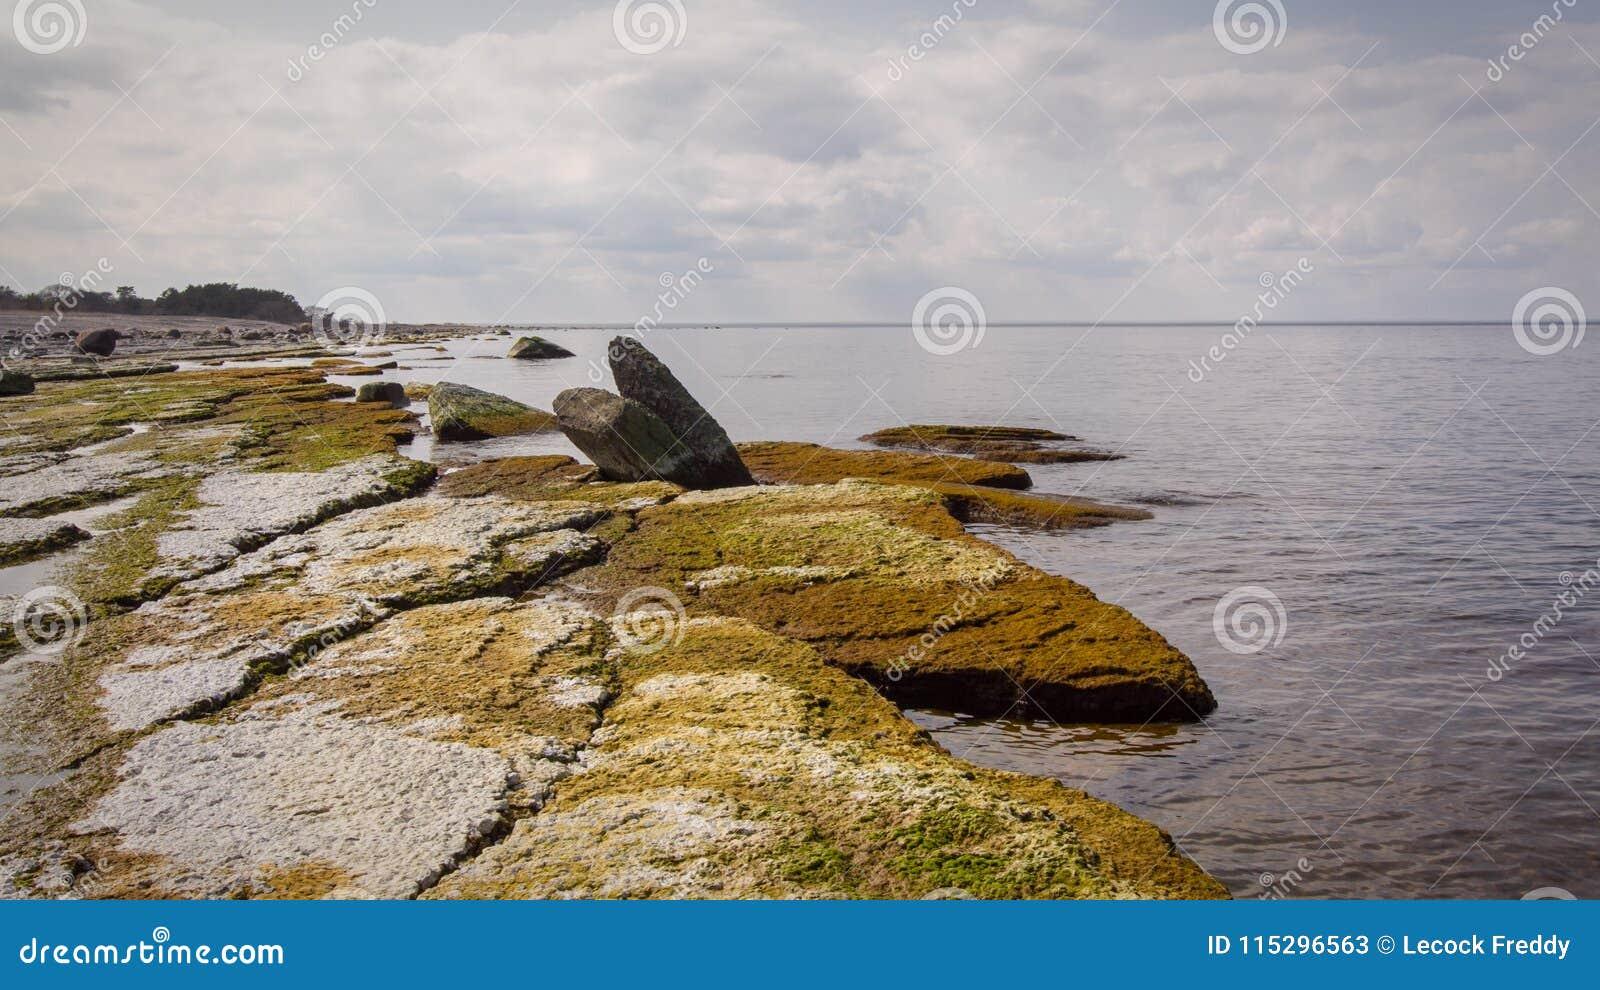 Öland costal view